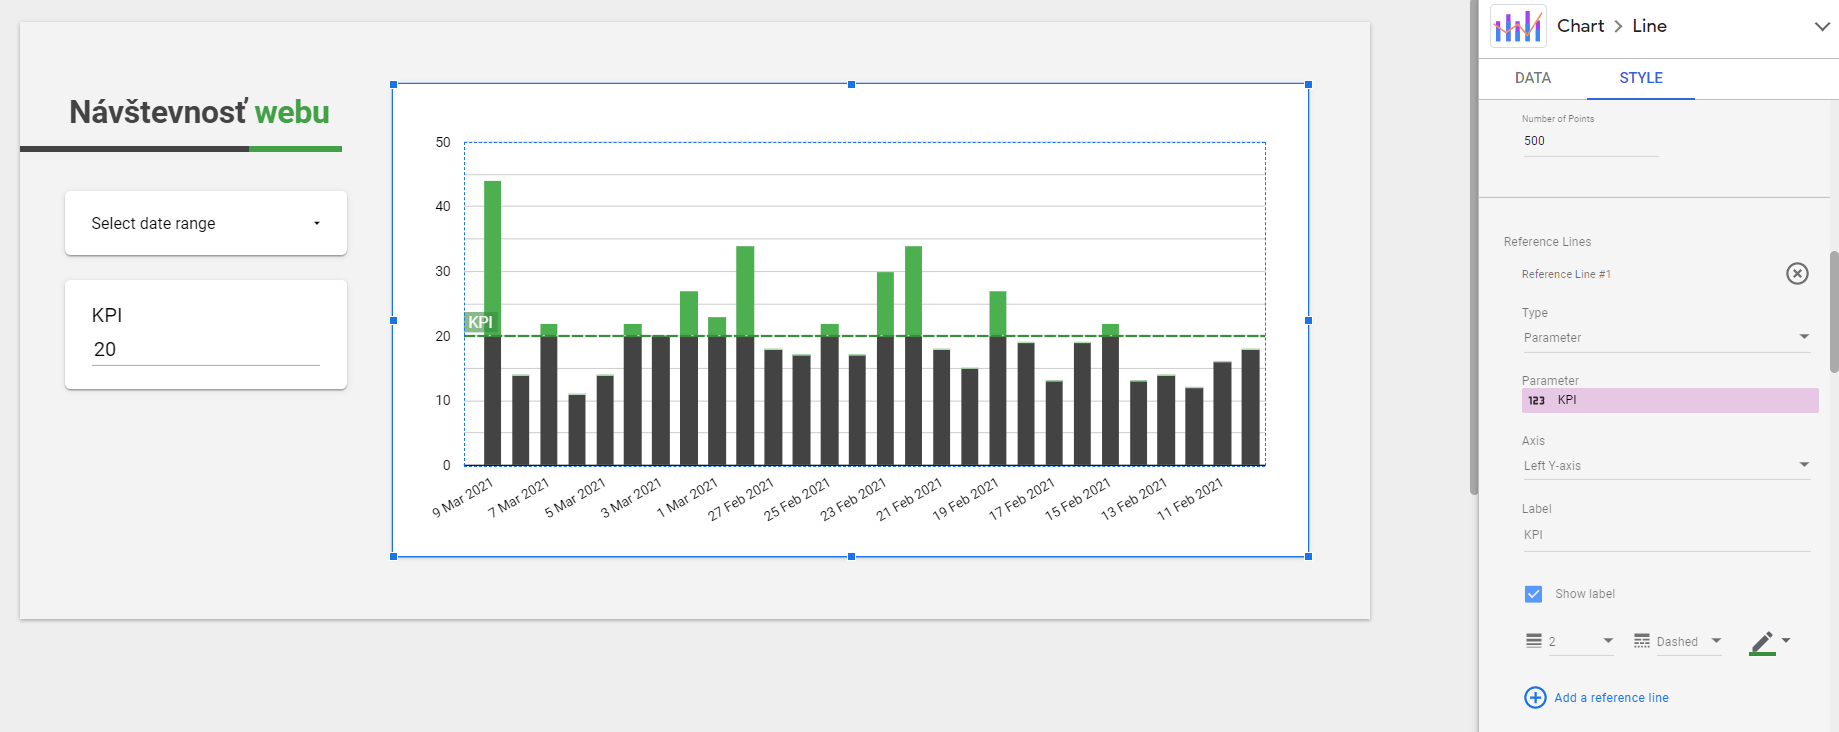 parameter reference line data studio